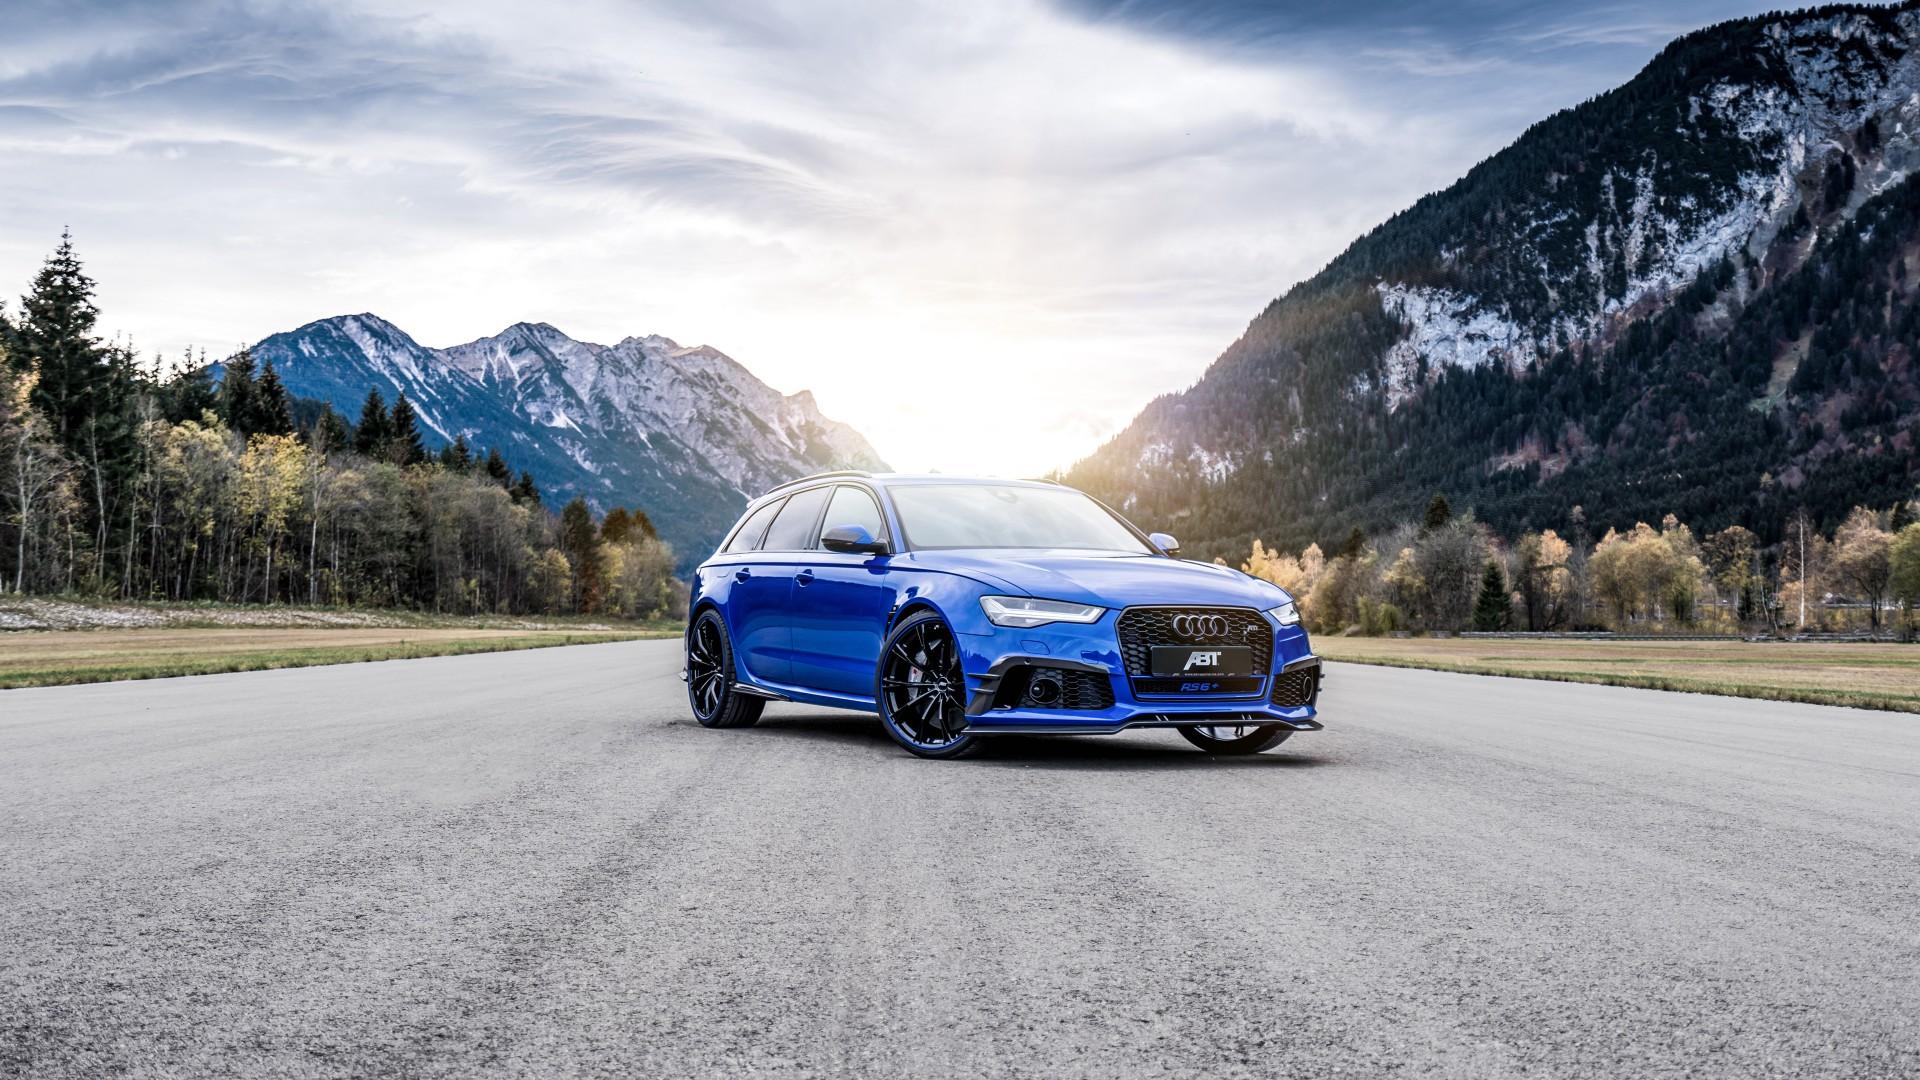 Abt Audi Rs 6 Nogaro Edition 4k Wallpaper Hd Car Wallpapers Id 11602